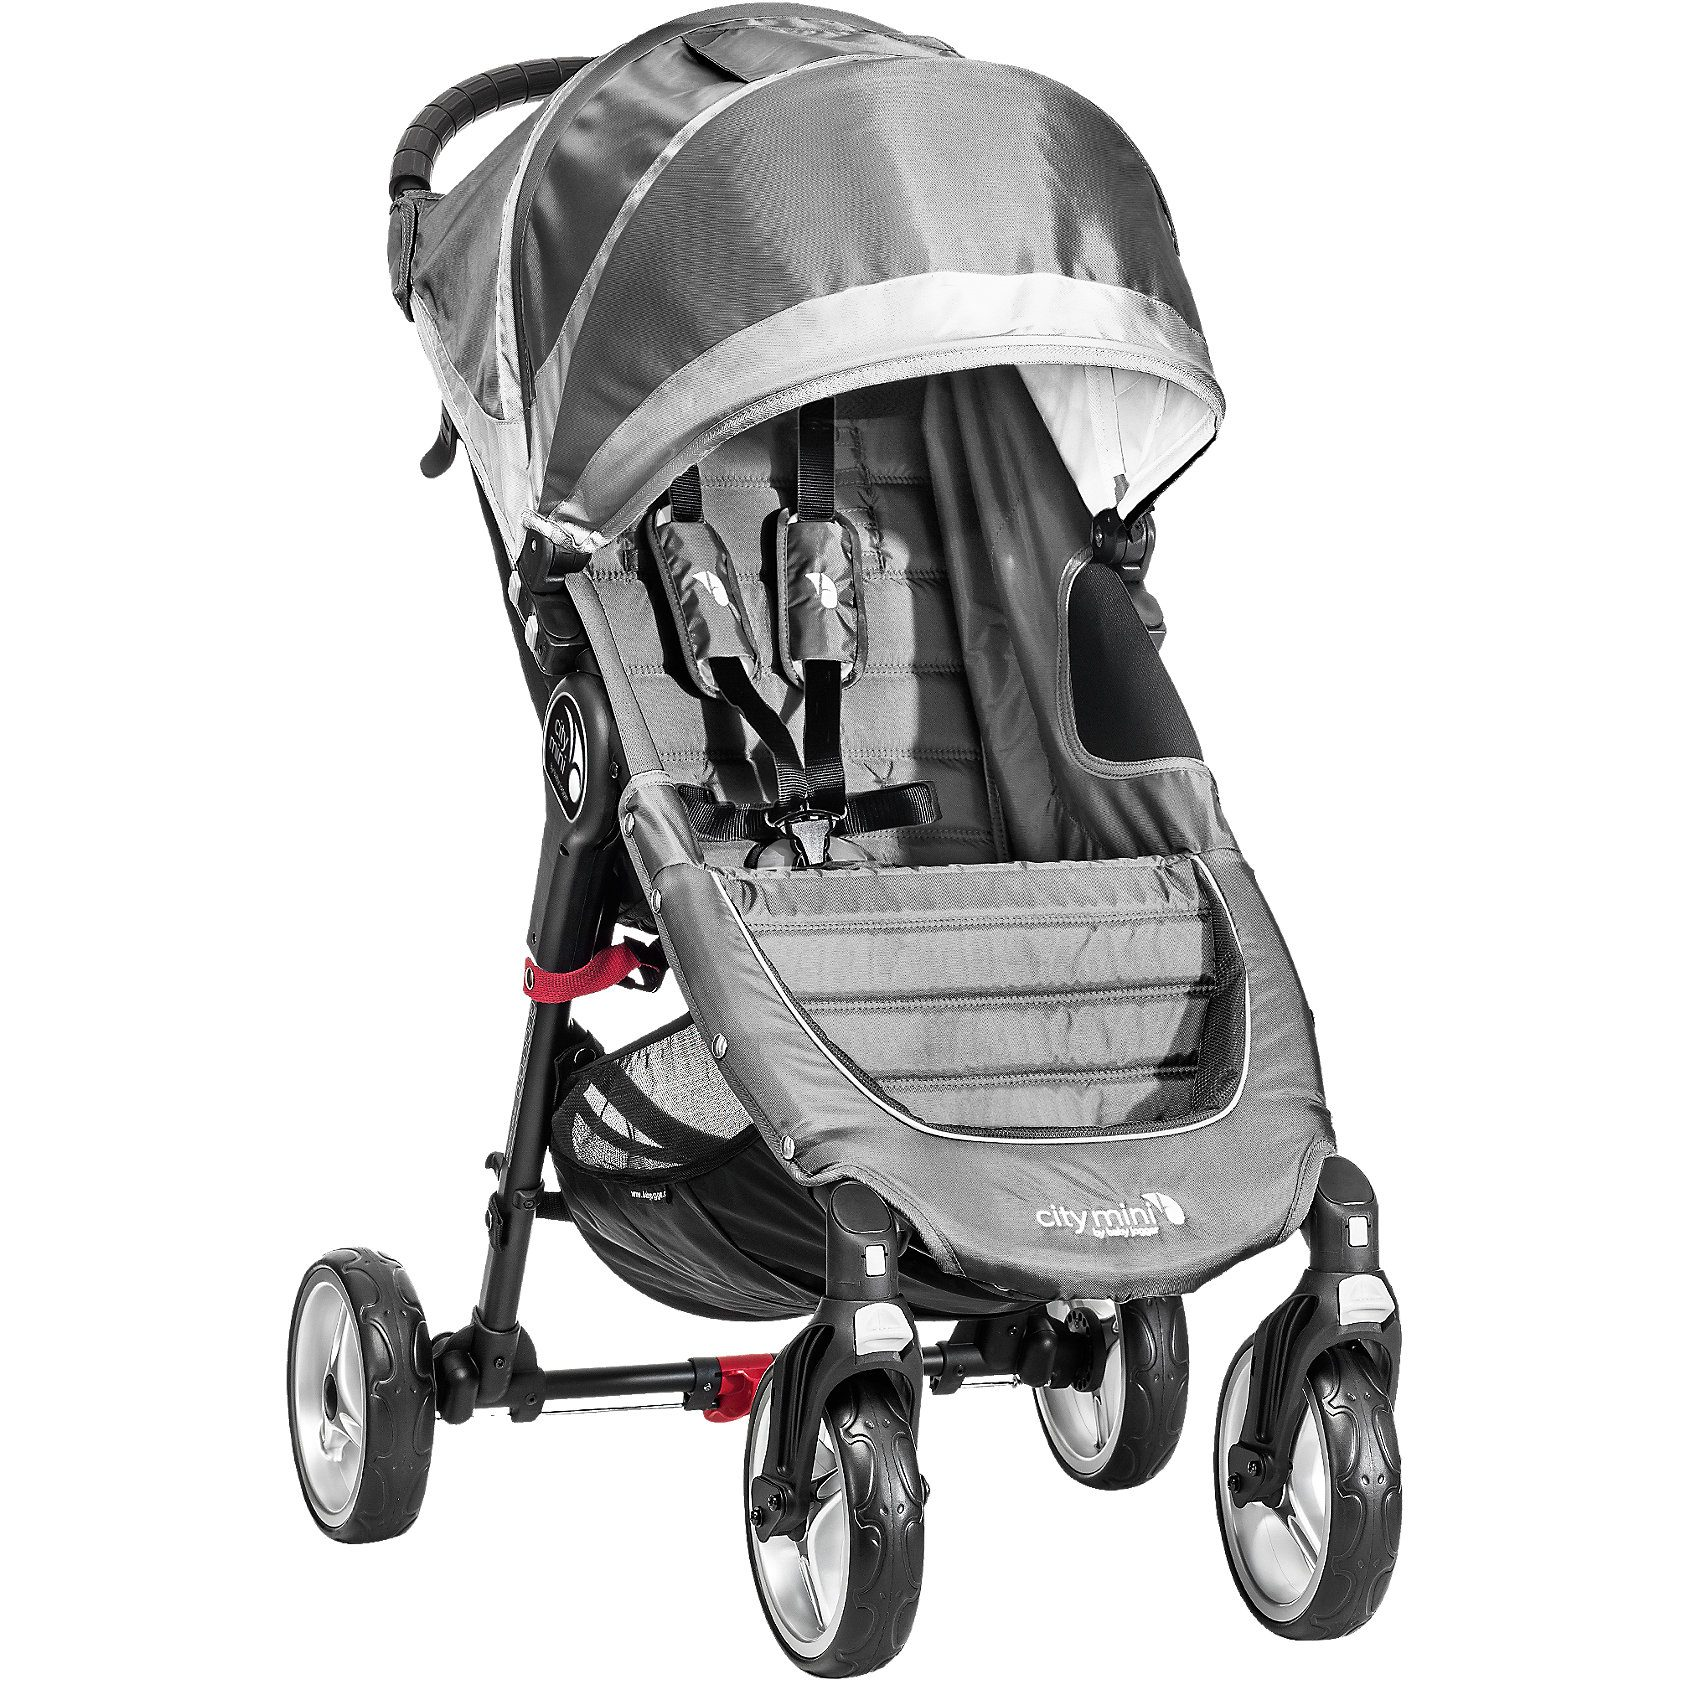 Baby Jogger Sportwagen City Mini 4-Rad, steel/ gray, 2016